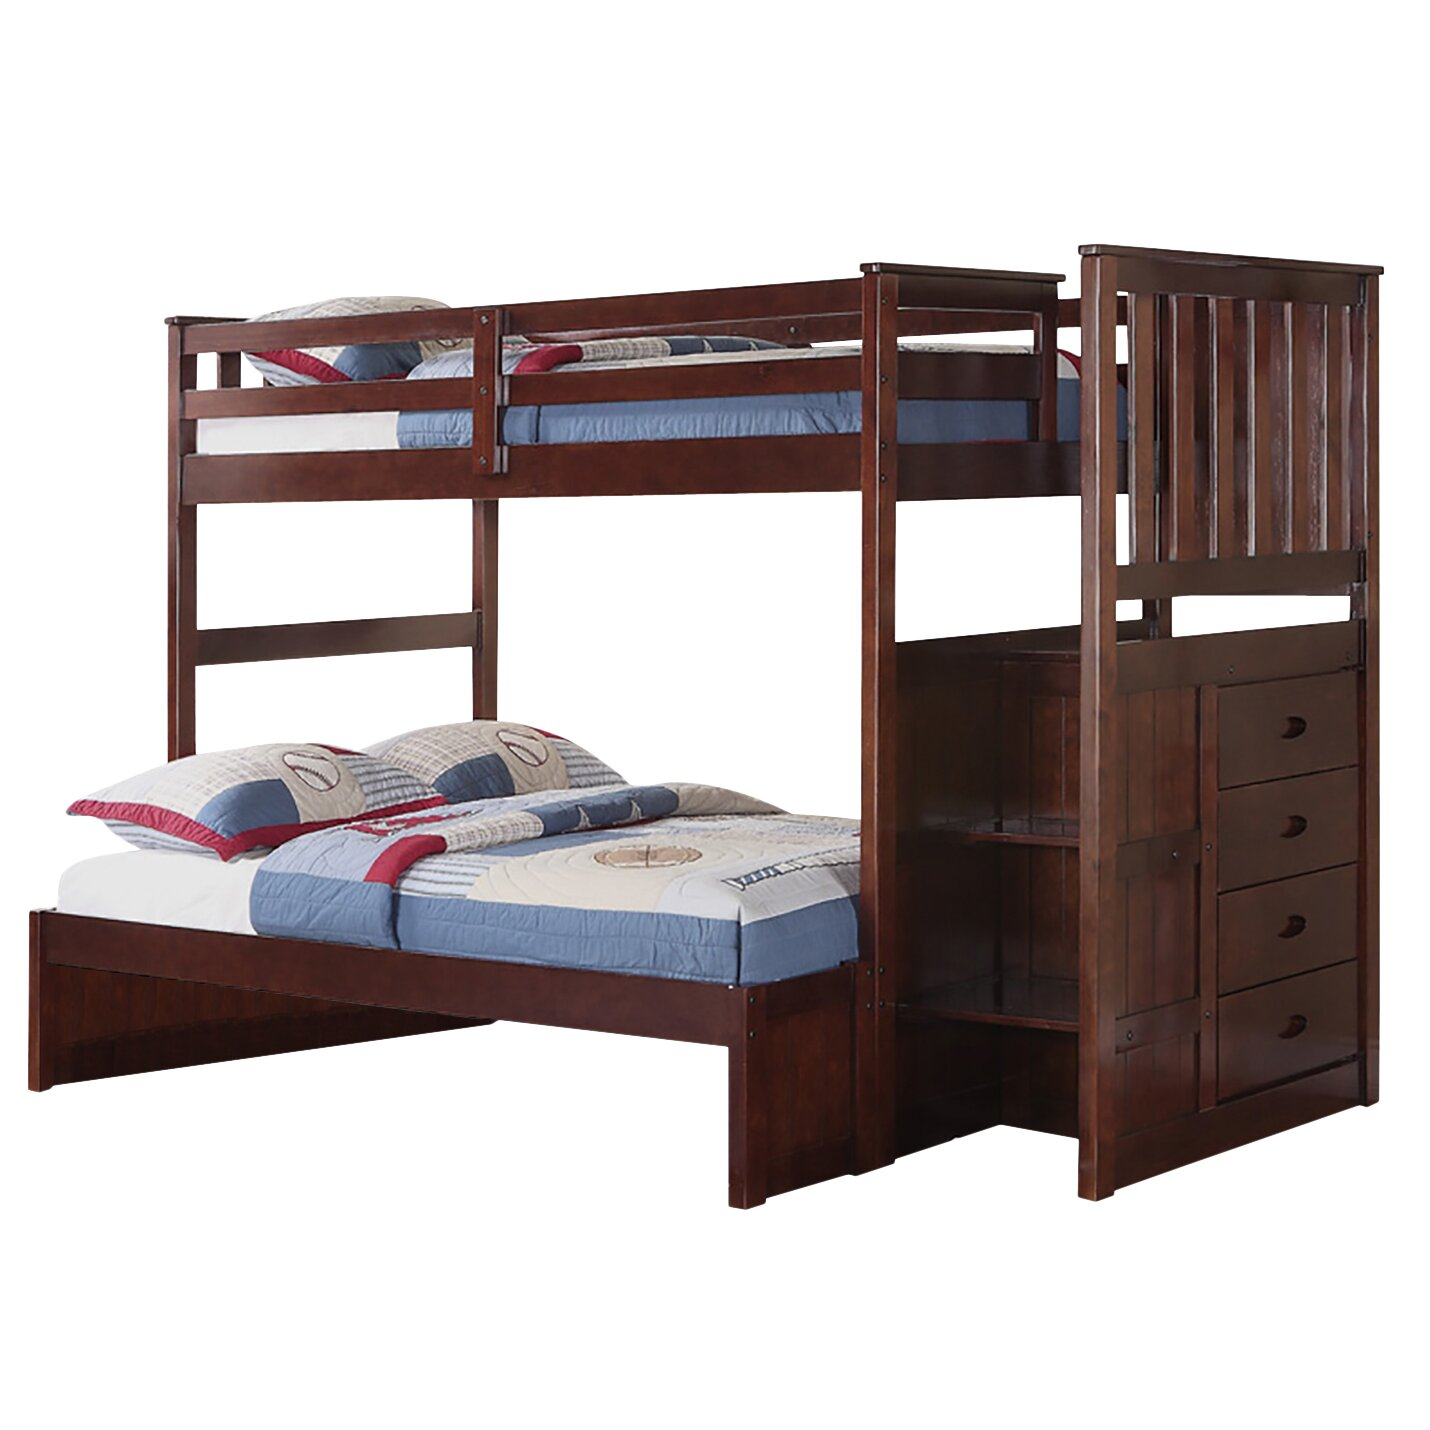 Nebraska Furniture Mart Bunk Beds Nebraska Furniture Mart Bunk Beds Prescott Twin Over Twin